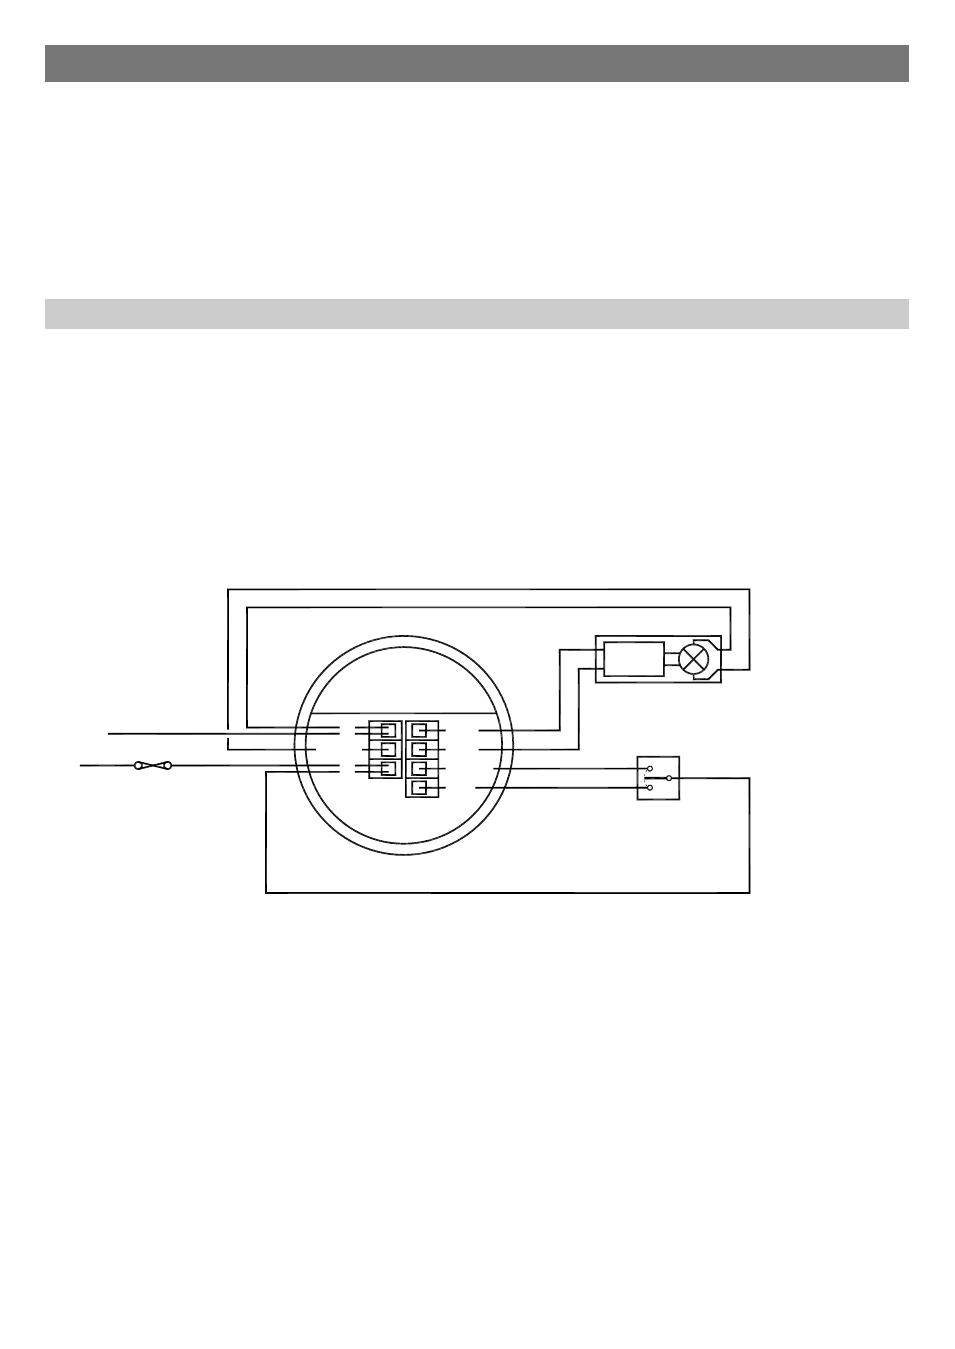 mk retractive switch wiring diagram